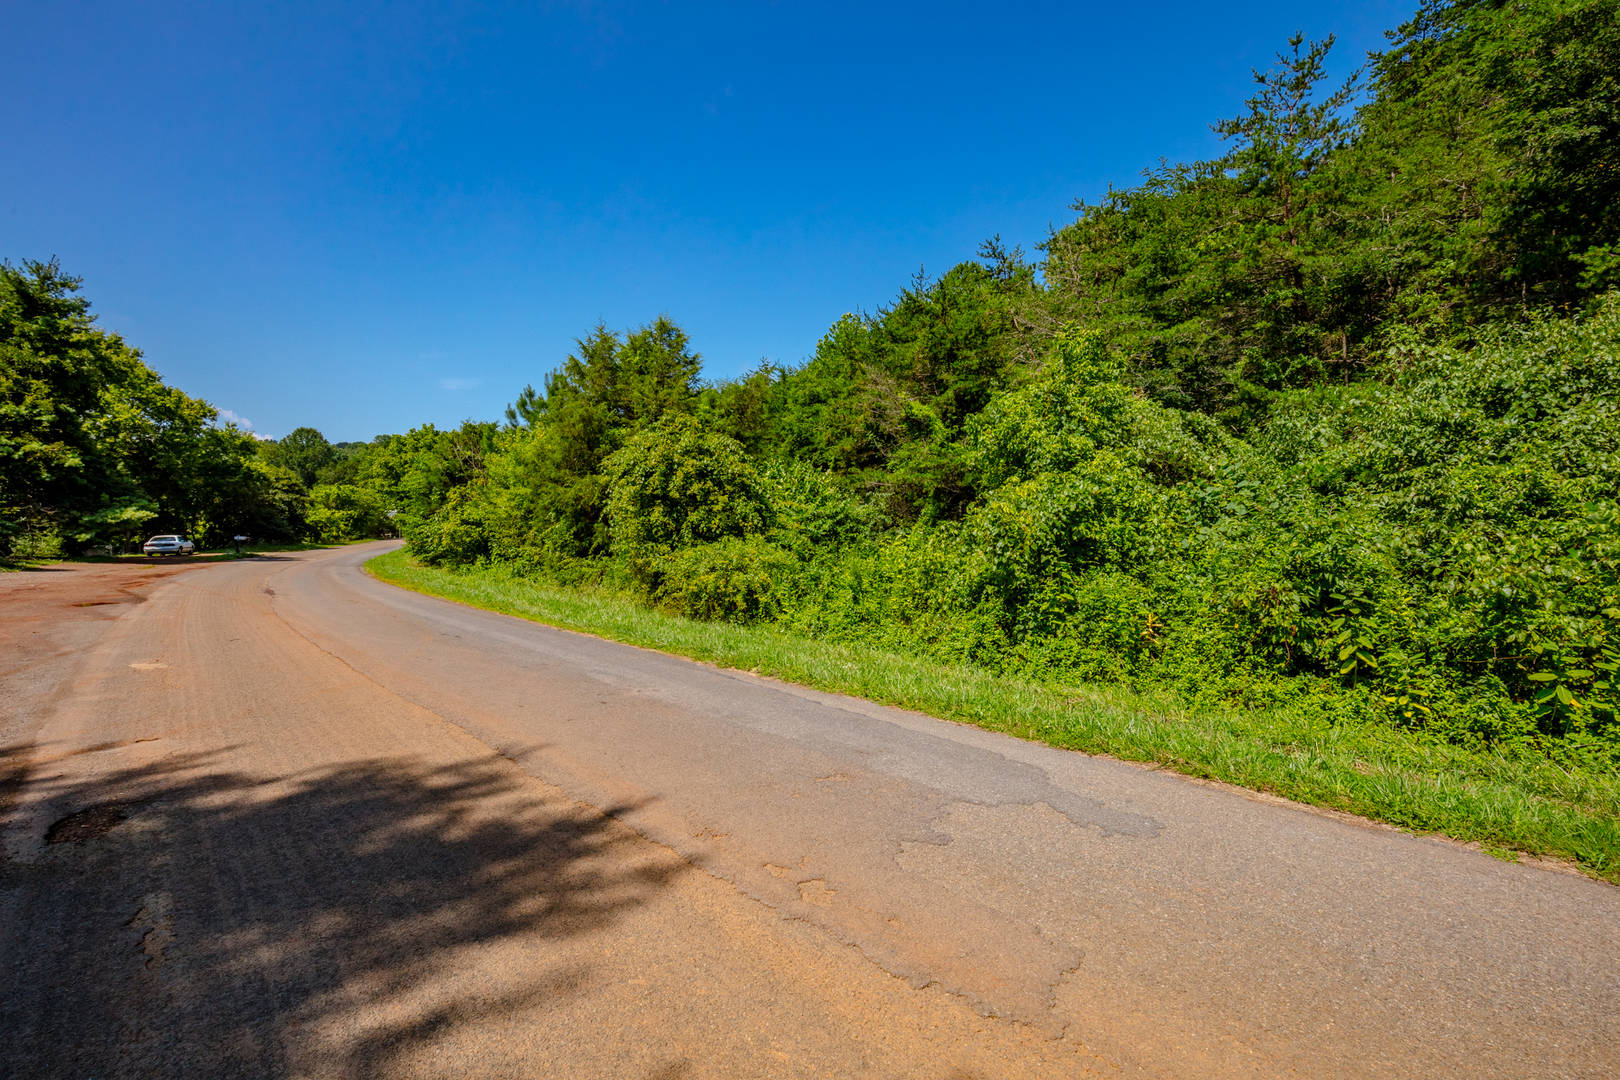 Lot 22 - Lone Ash Rd & Bald Meadow Lane Barren Springs, VA 24313